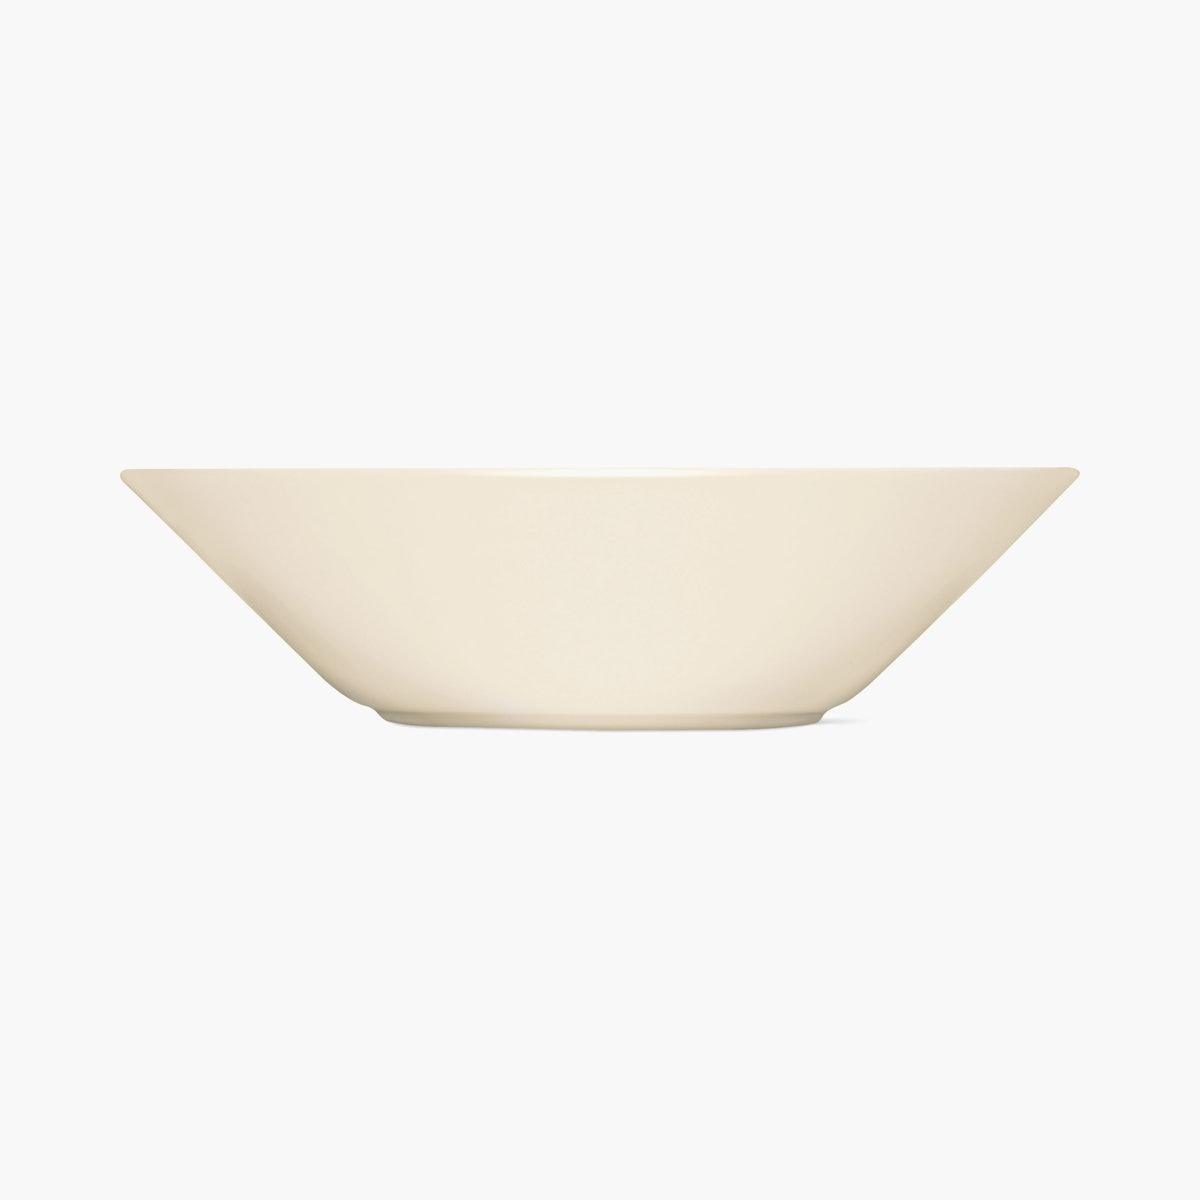 Teema Pasta Bowl, Set of 4